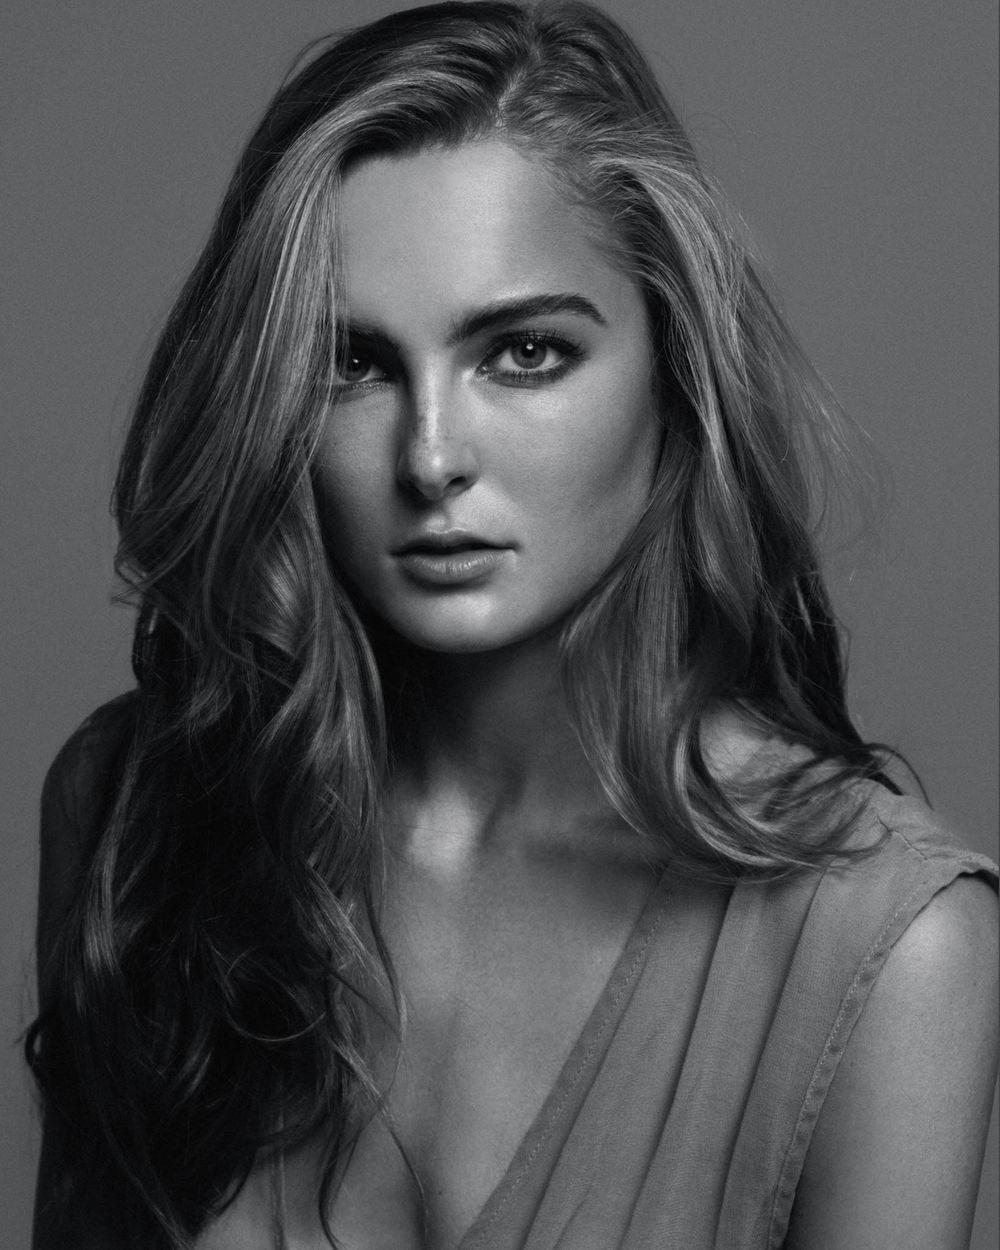 makeup-by-Mariana-Bull-01.jpg